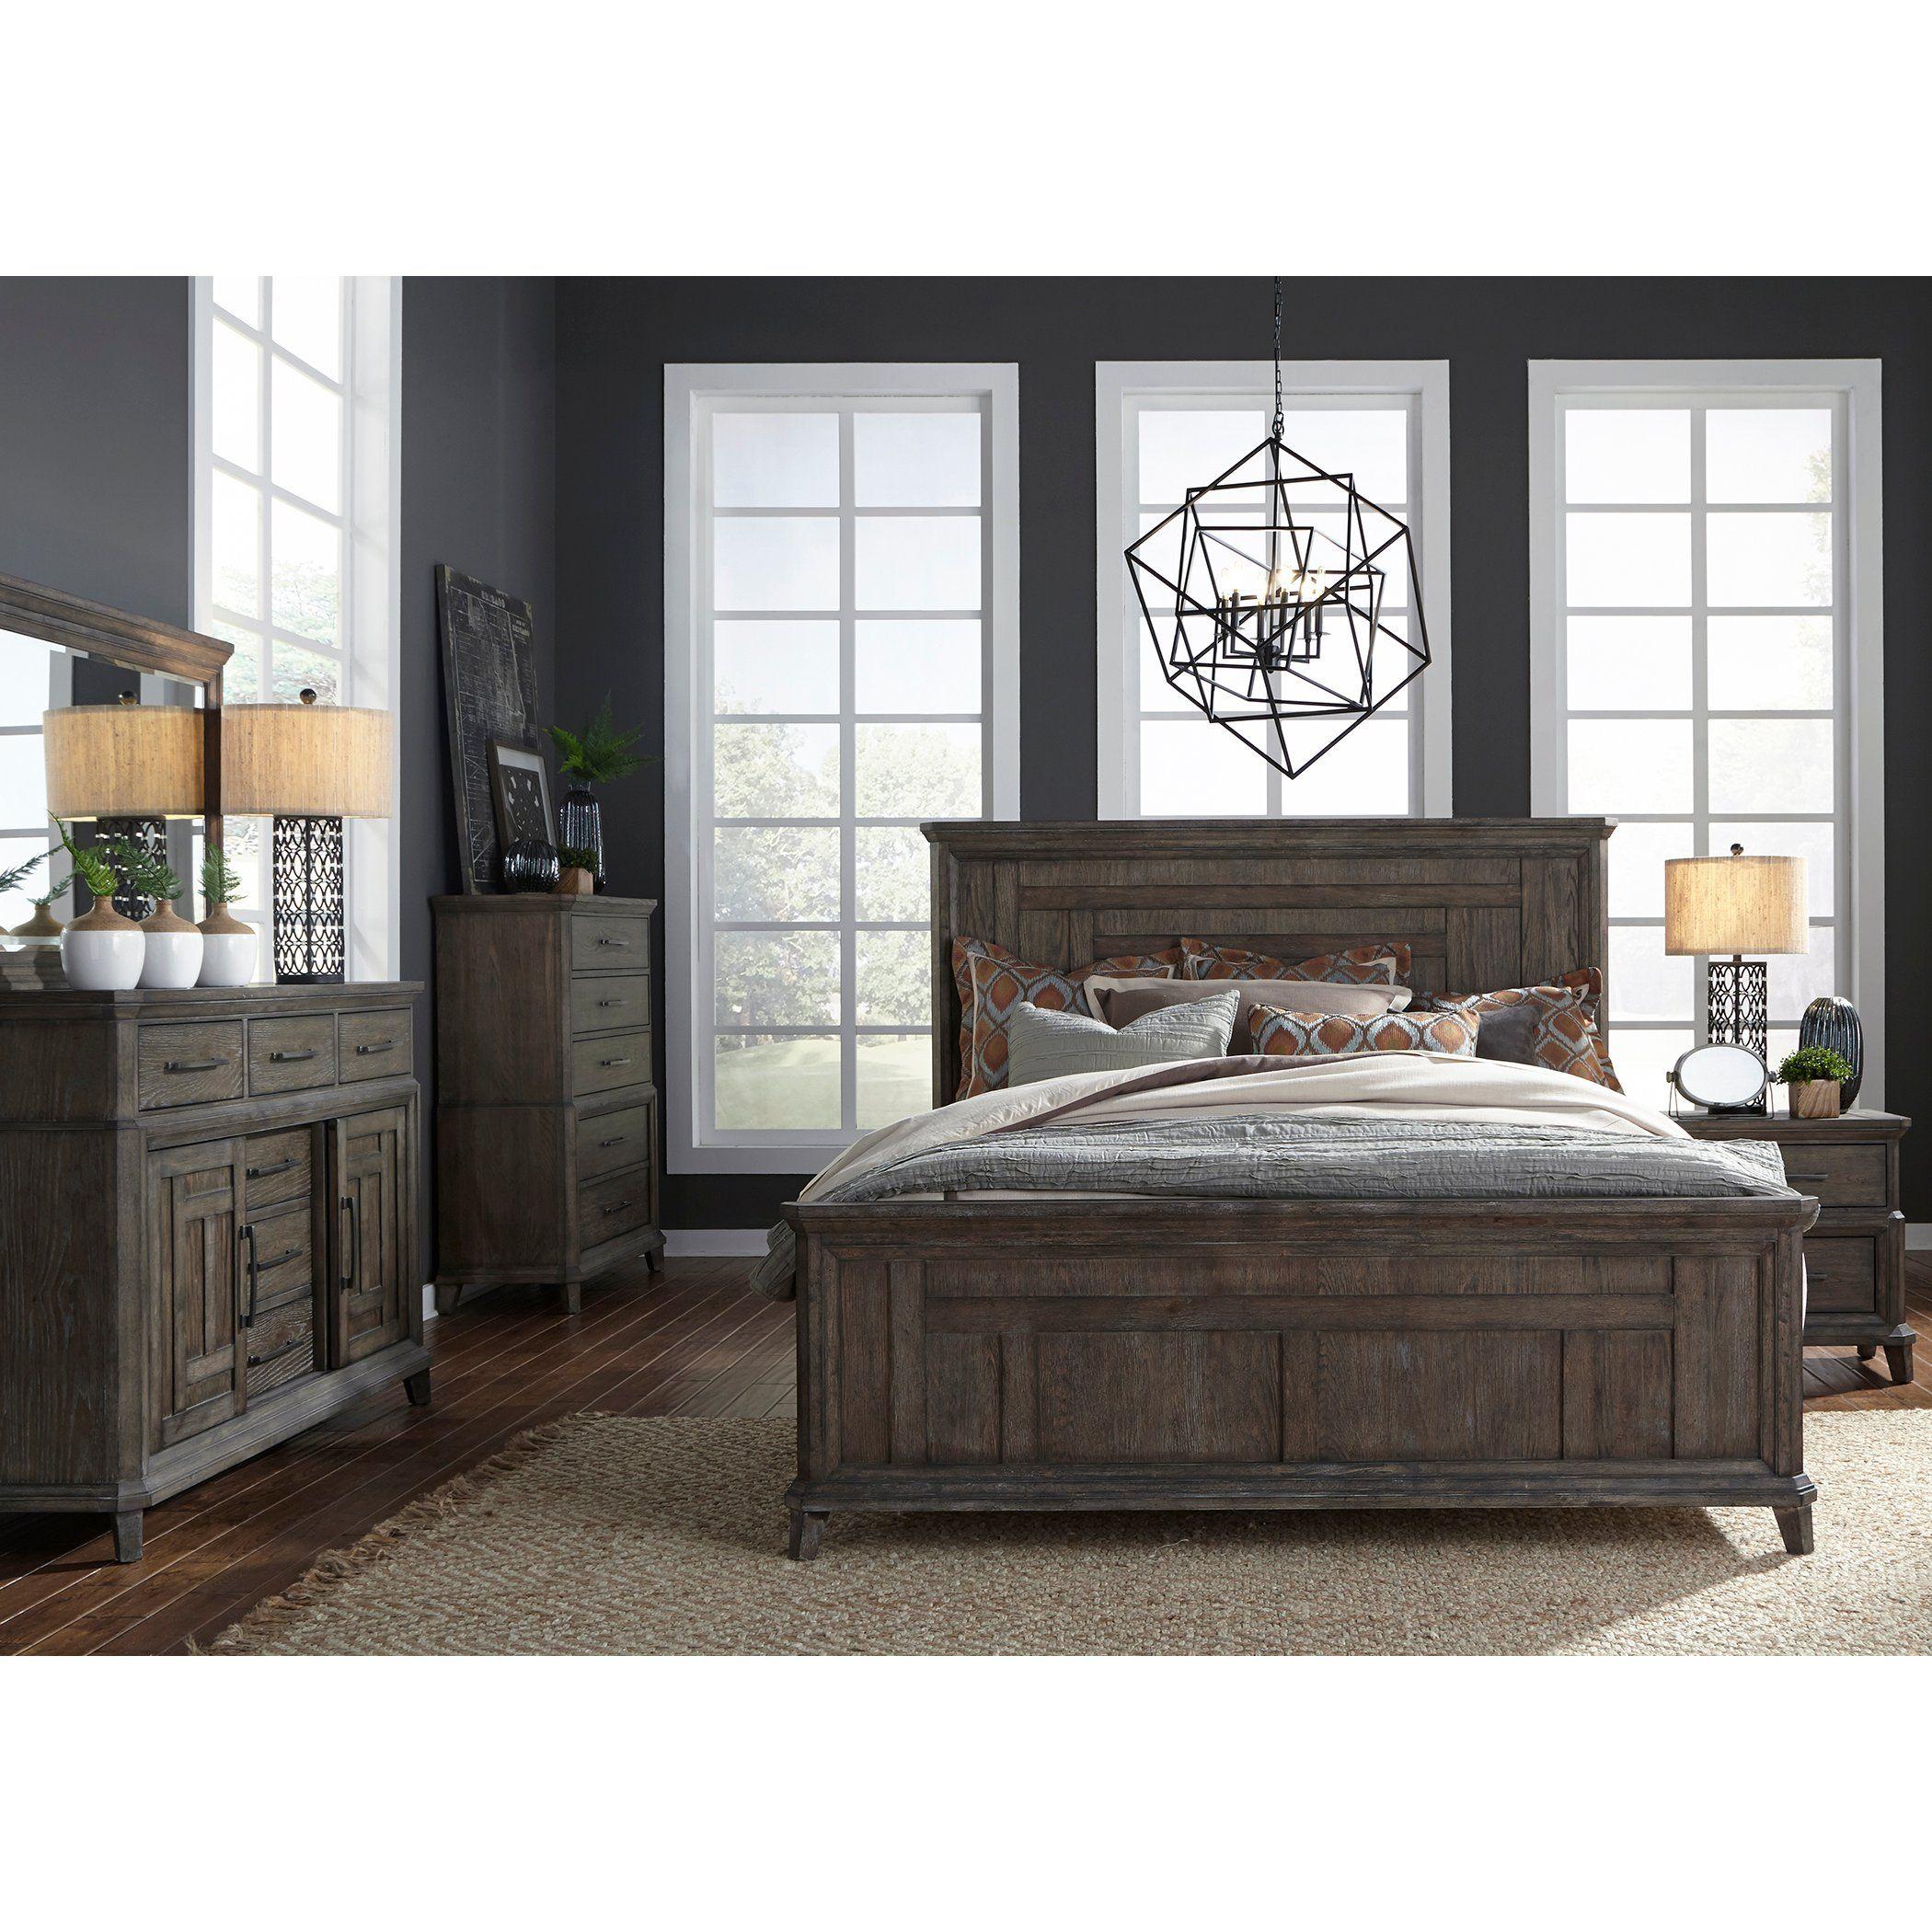 Classic Industrial Aged Oak 4 Piece King Bedroom Set